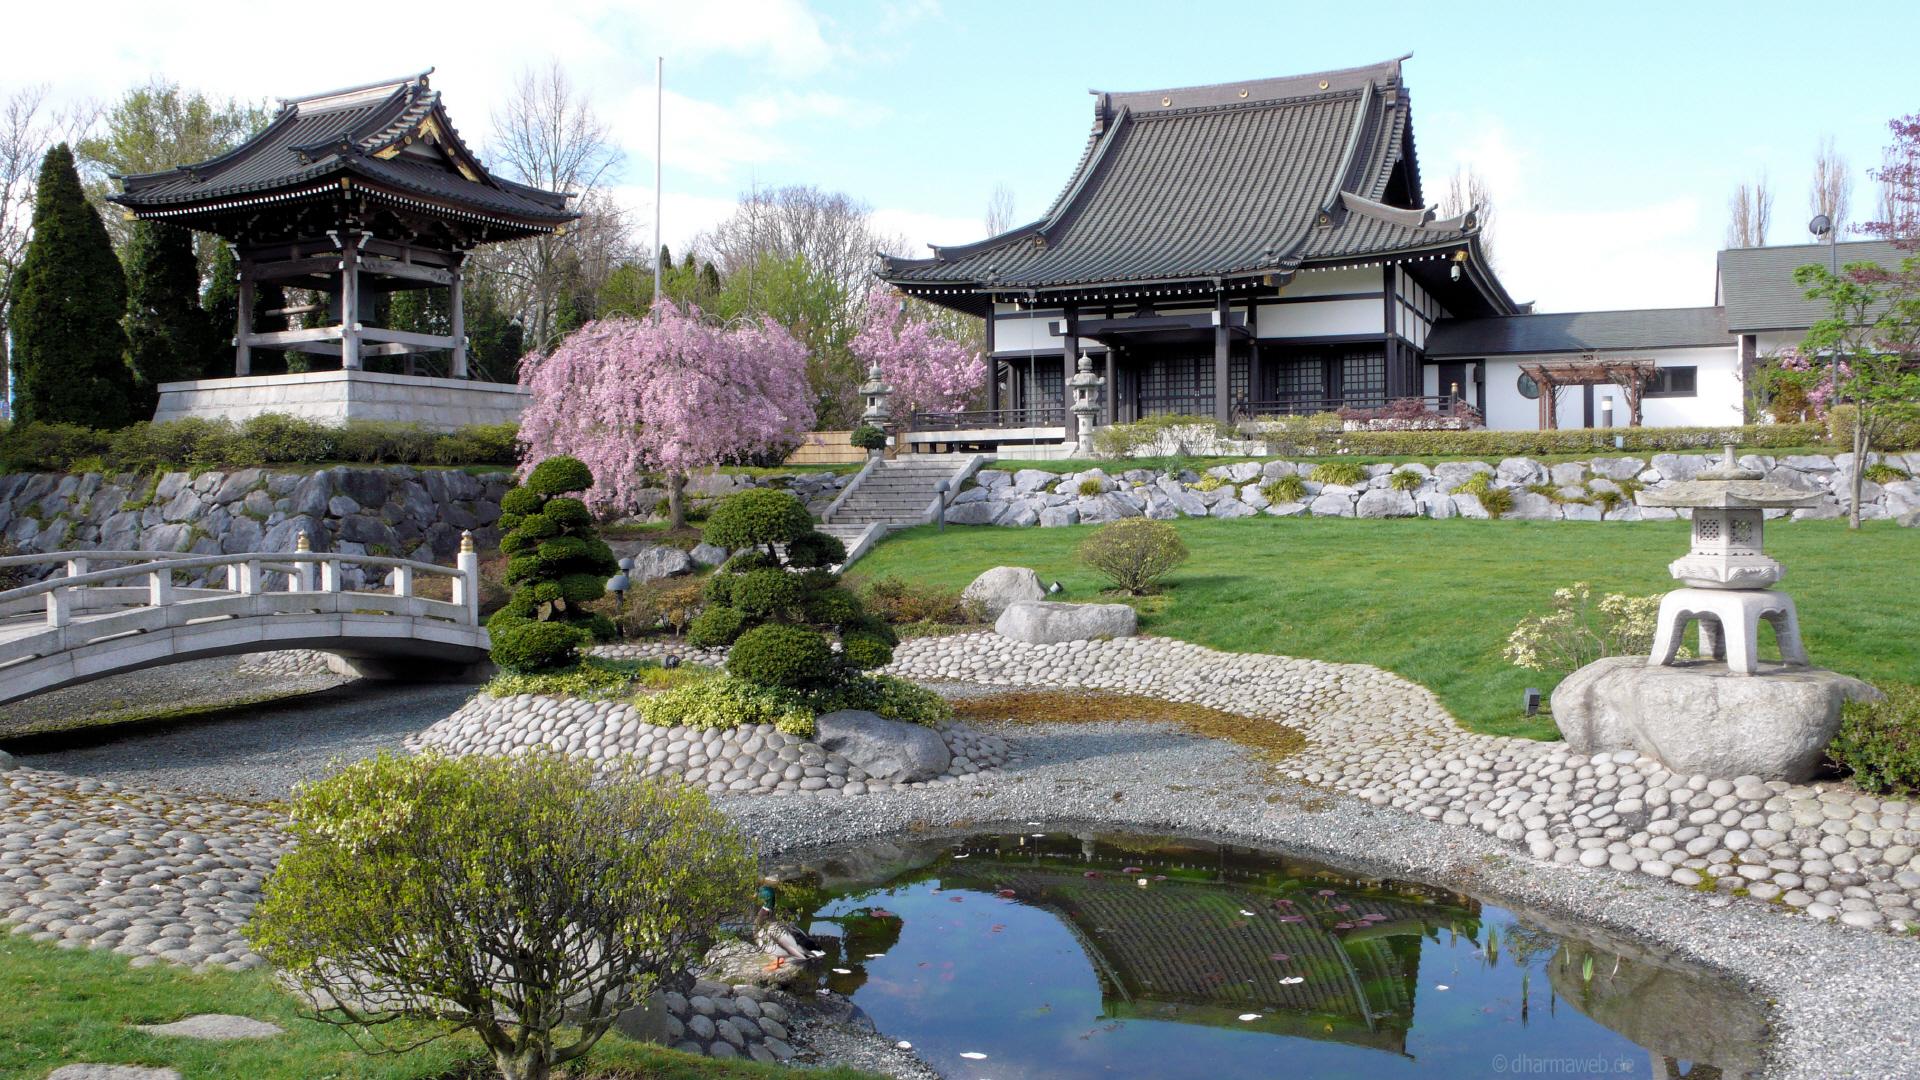 Http snug for Japanischer garten pool